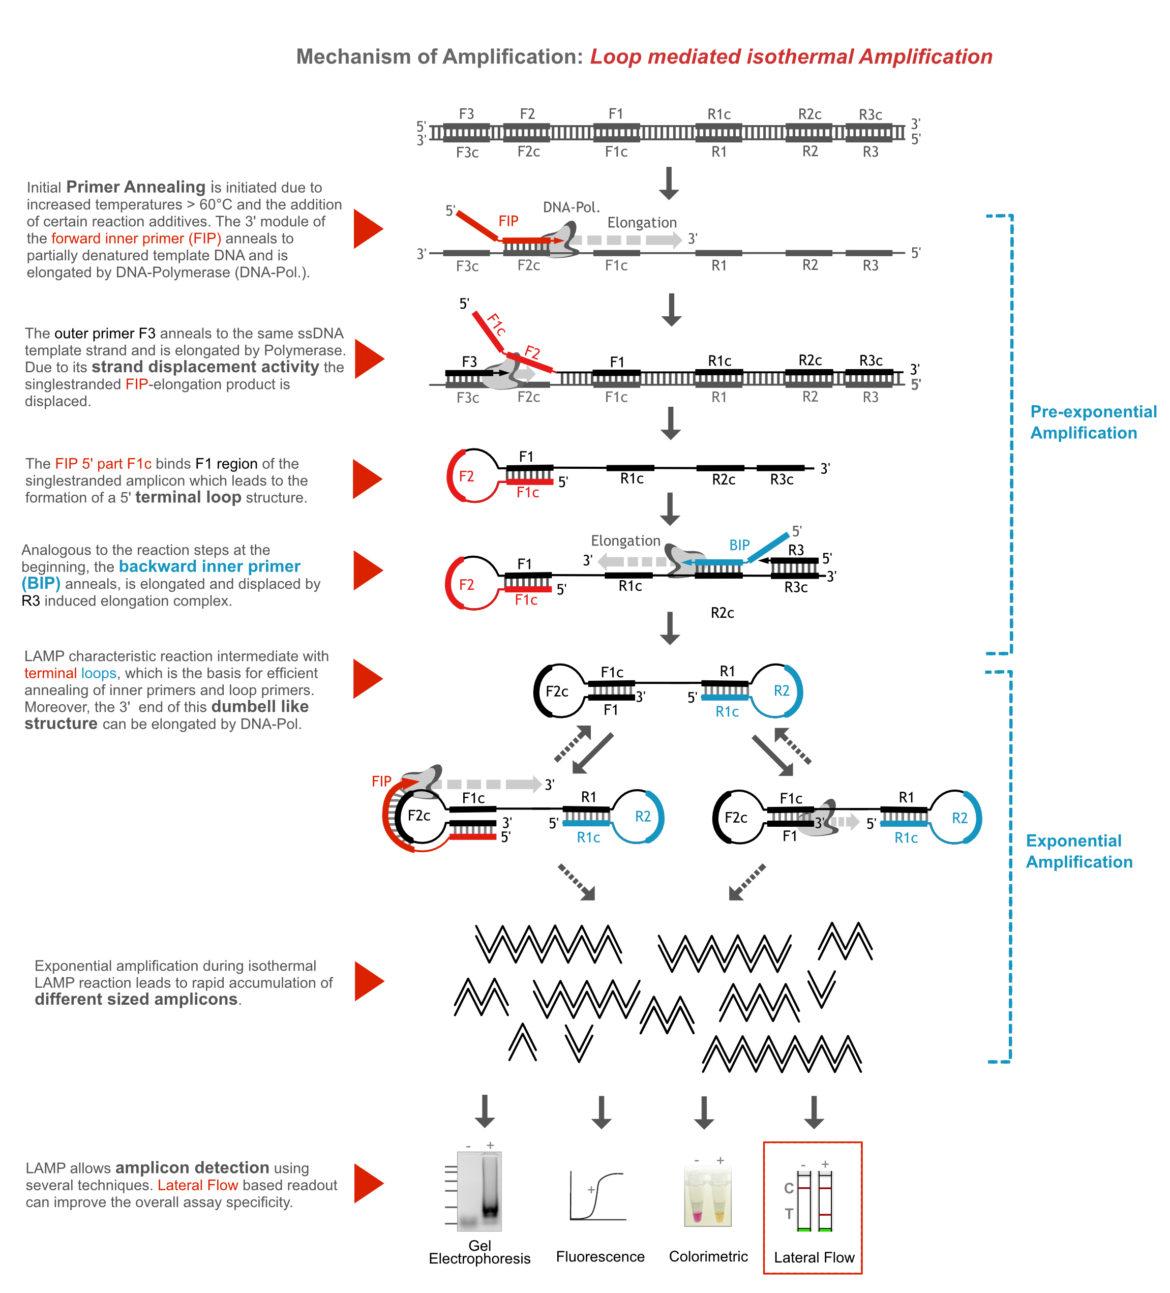 General Amplification Mechanism_Loop mediated isothermal Amplification